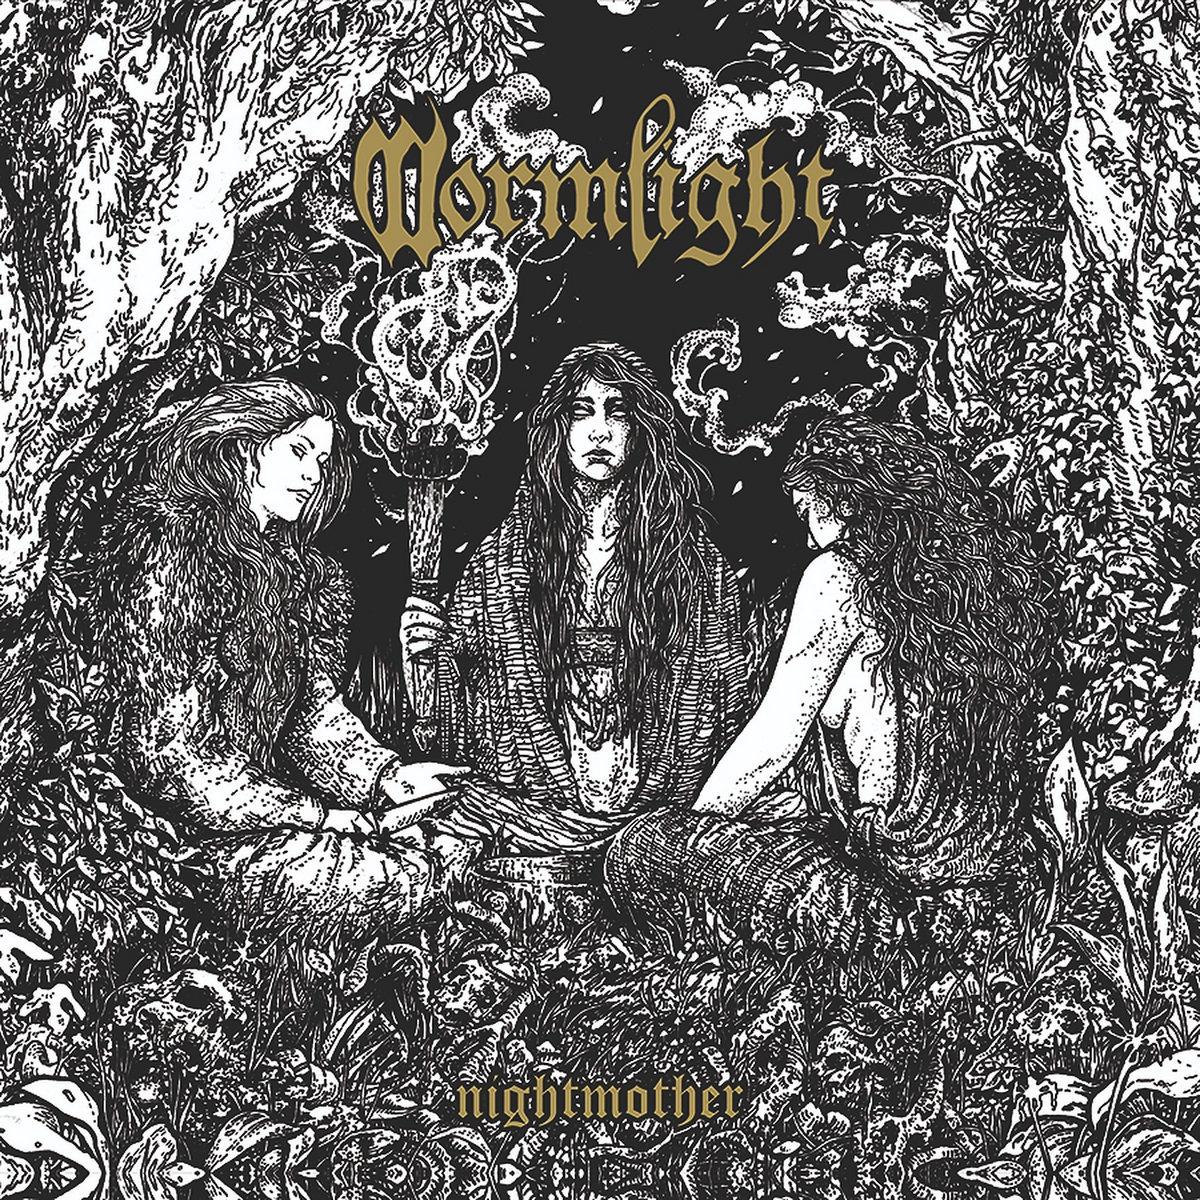 Nightmother Wormlight Album Cover Artwork 2021